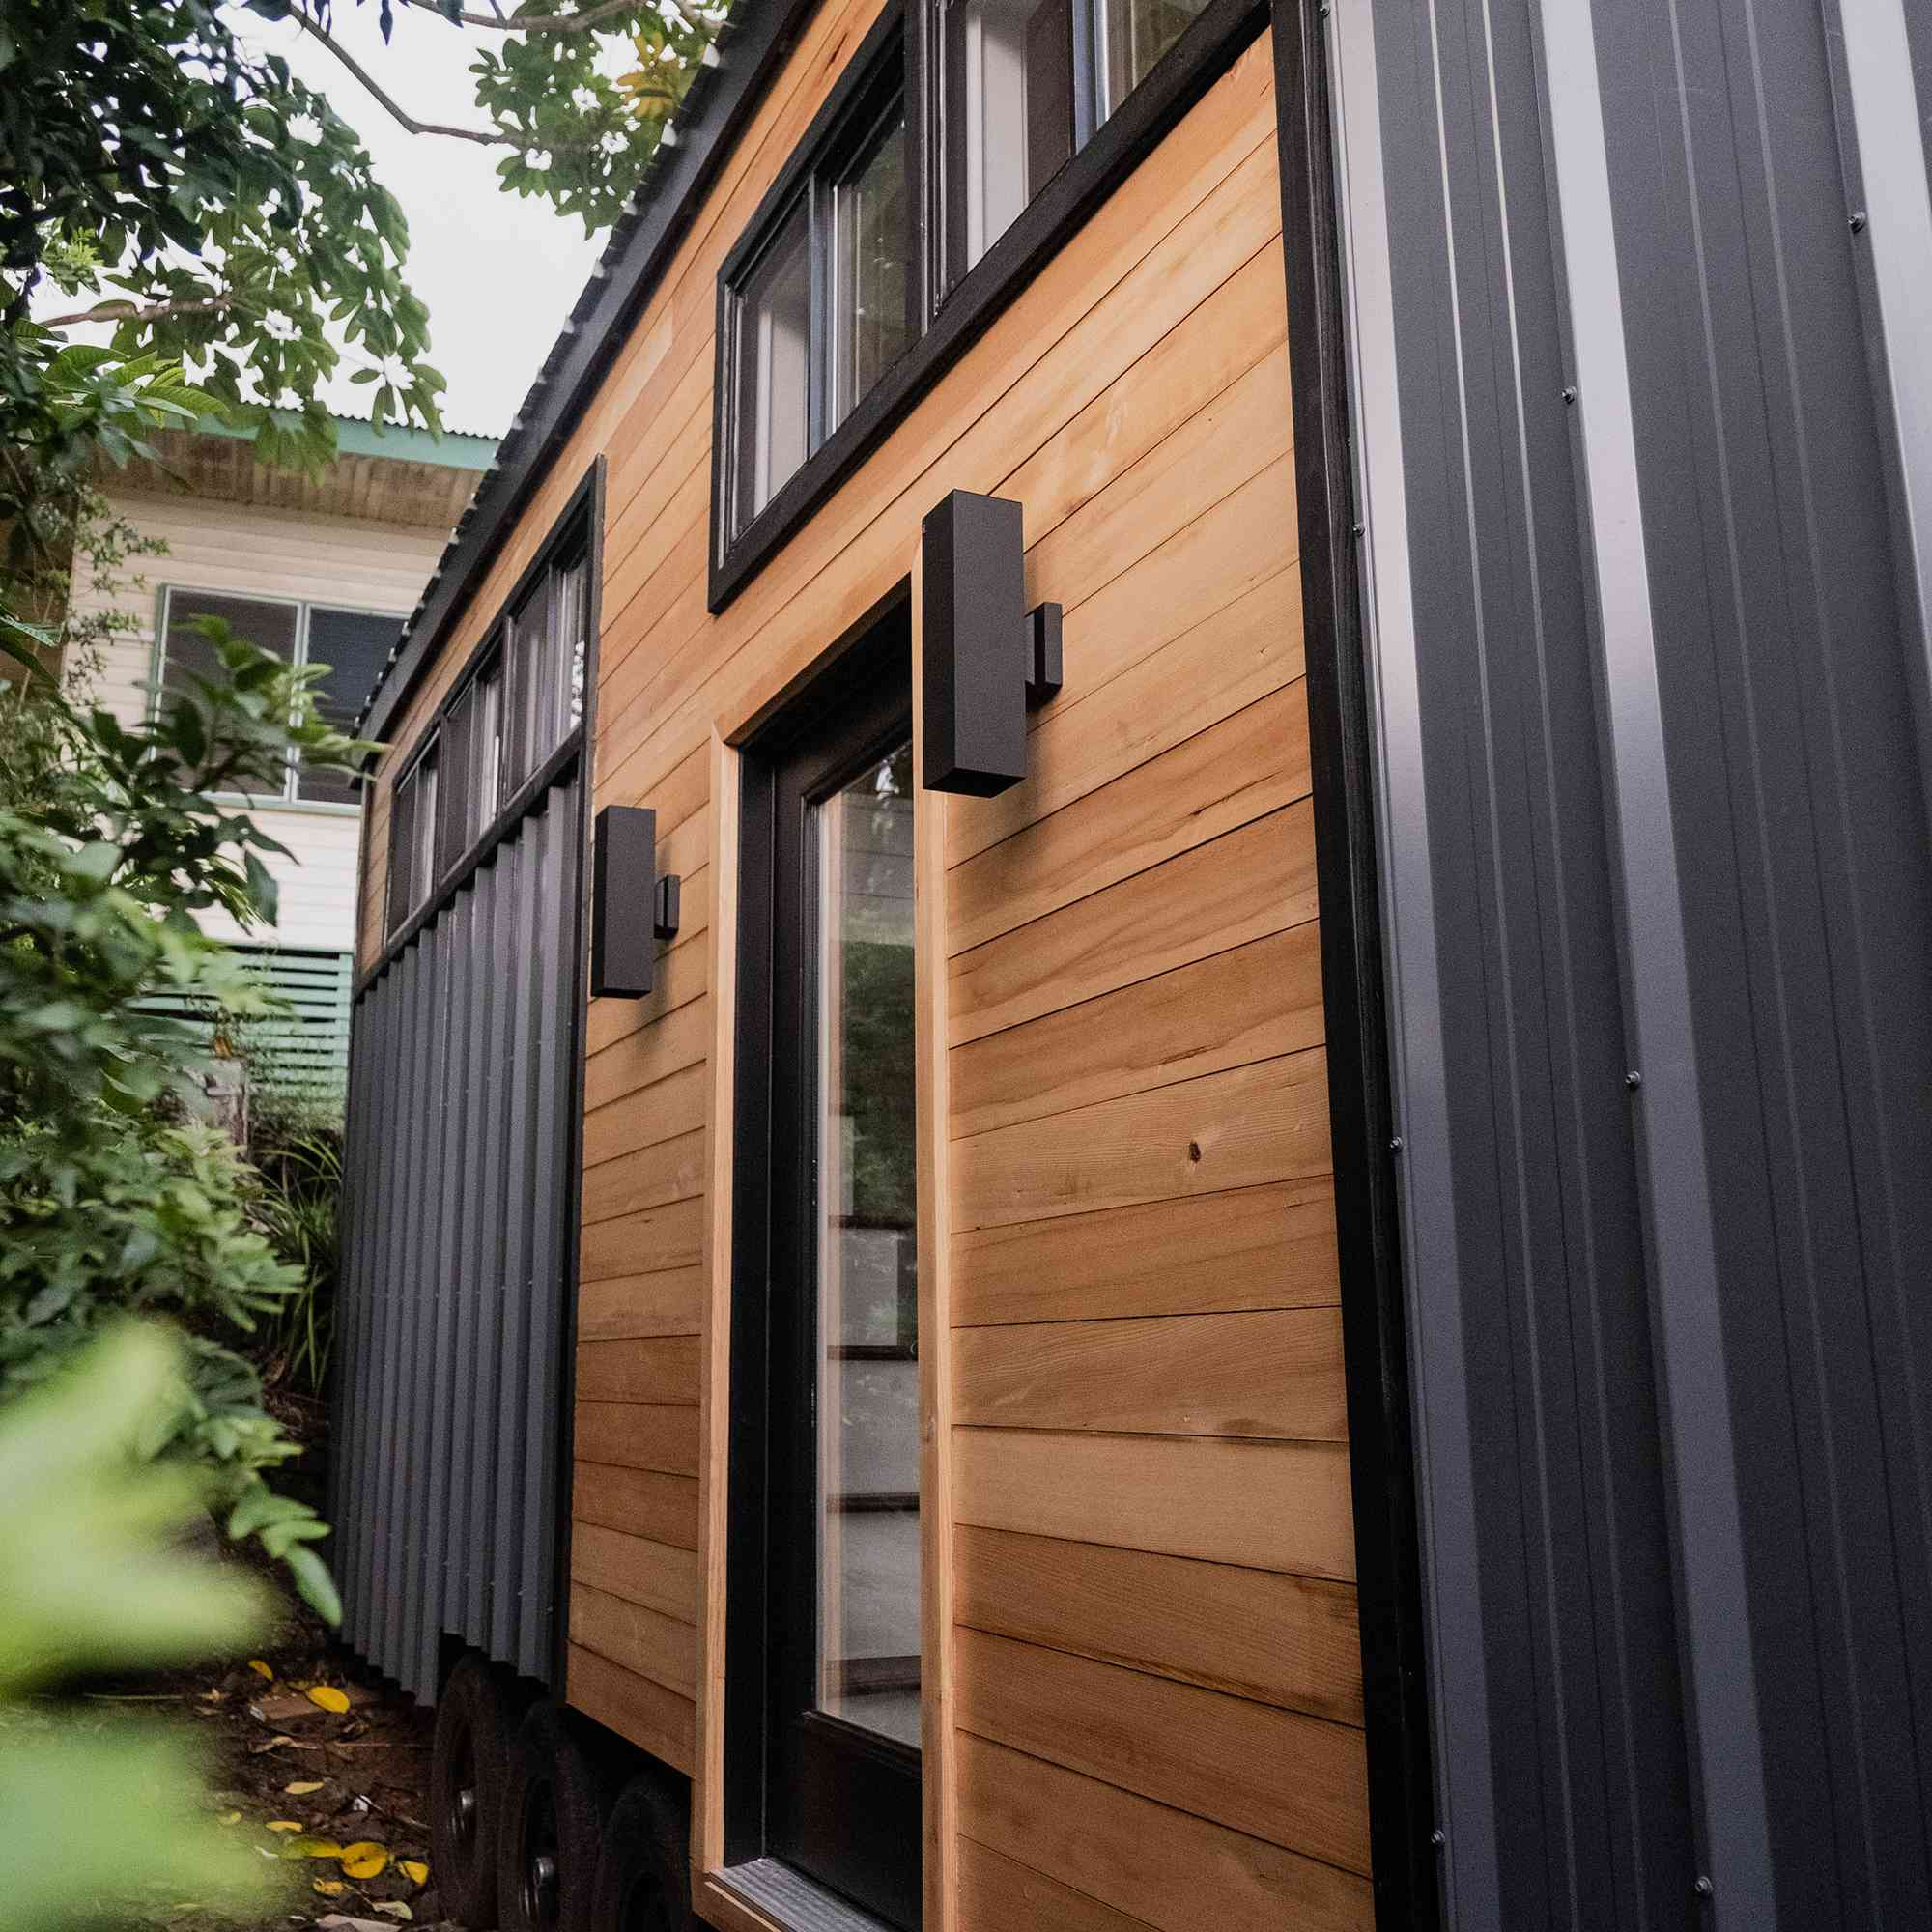 tiny house hawaii Taylor and Michaella McClendon exterior siding